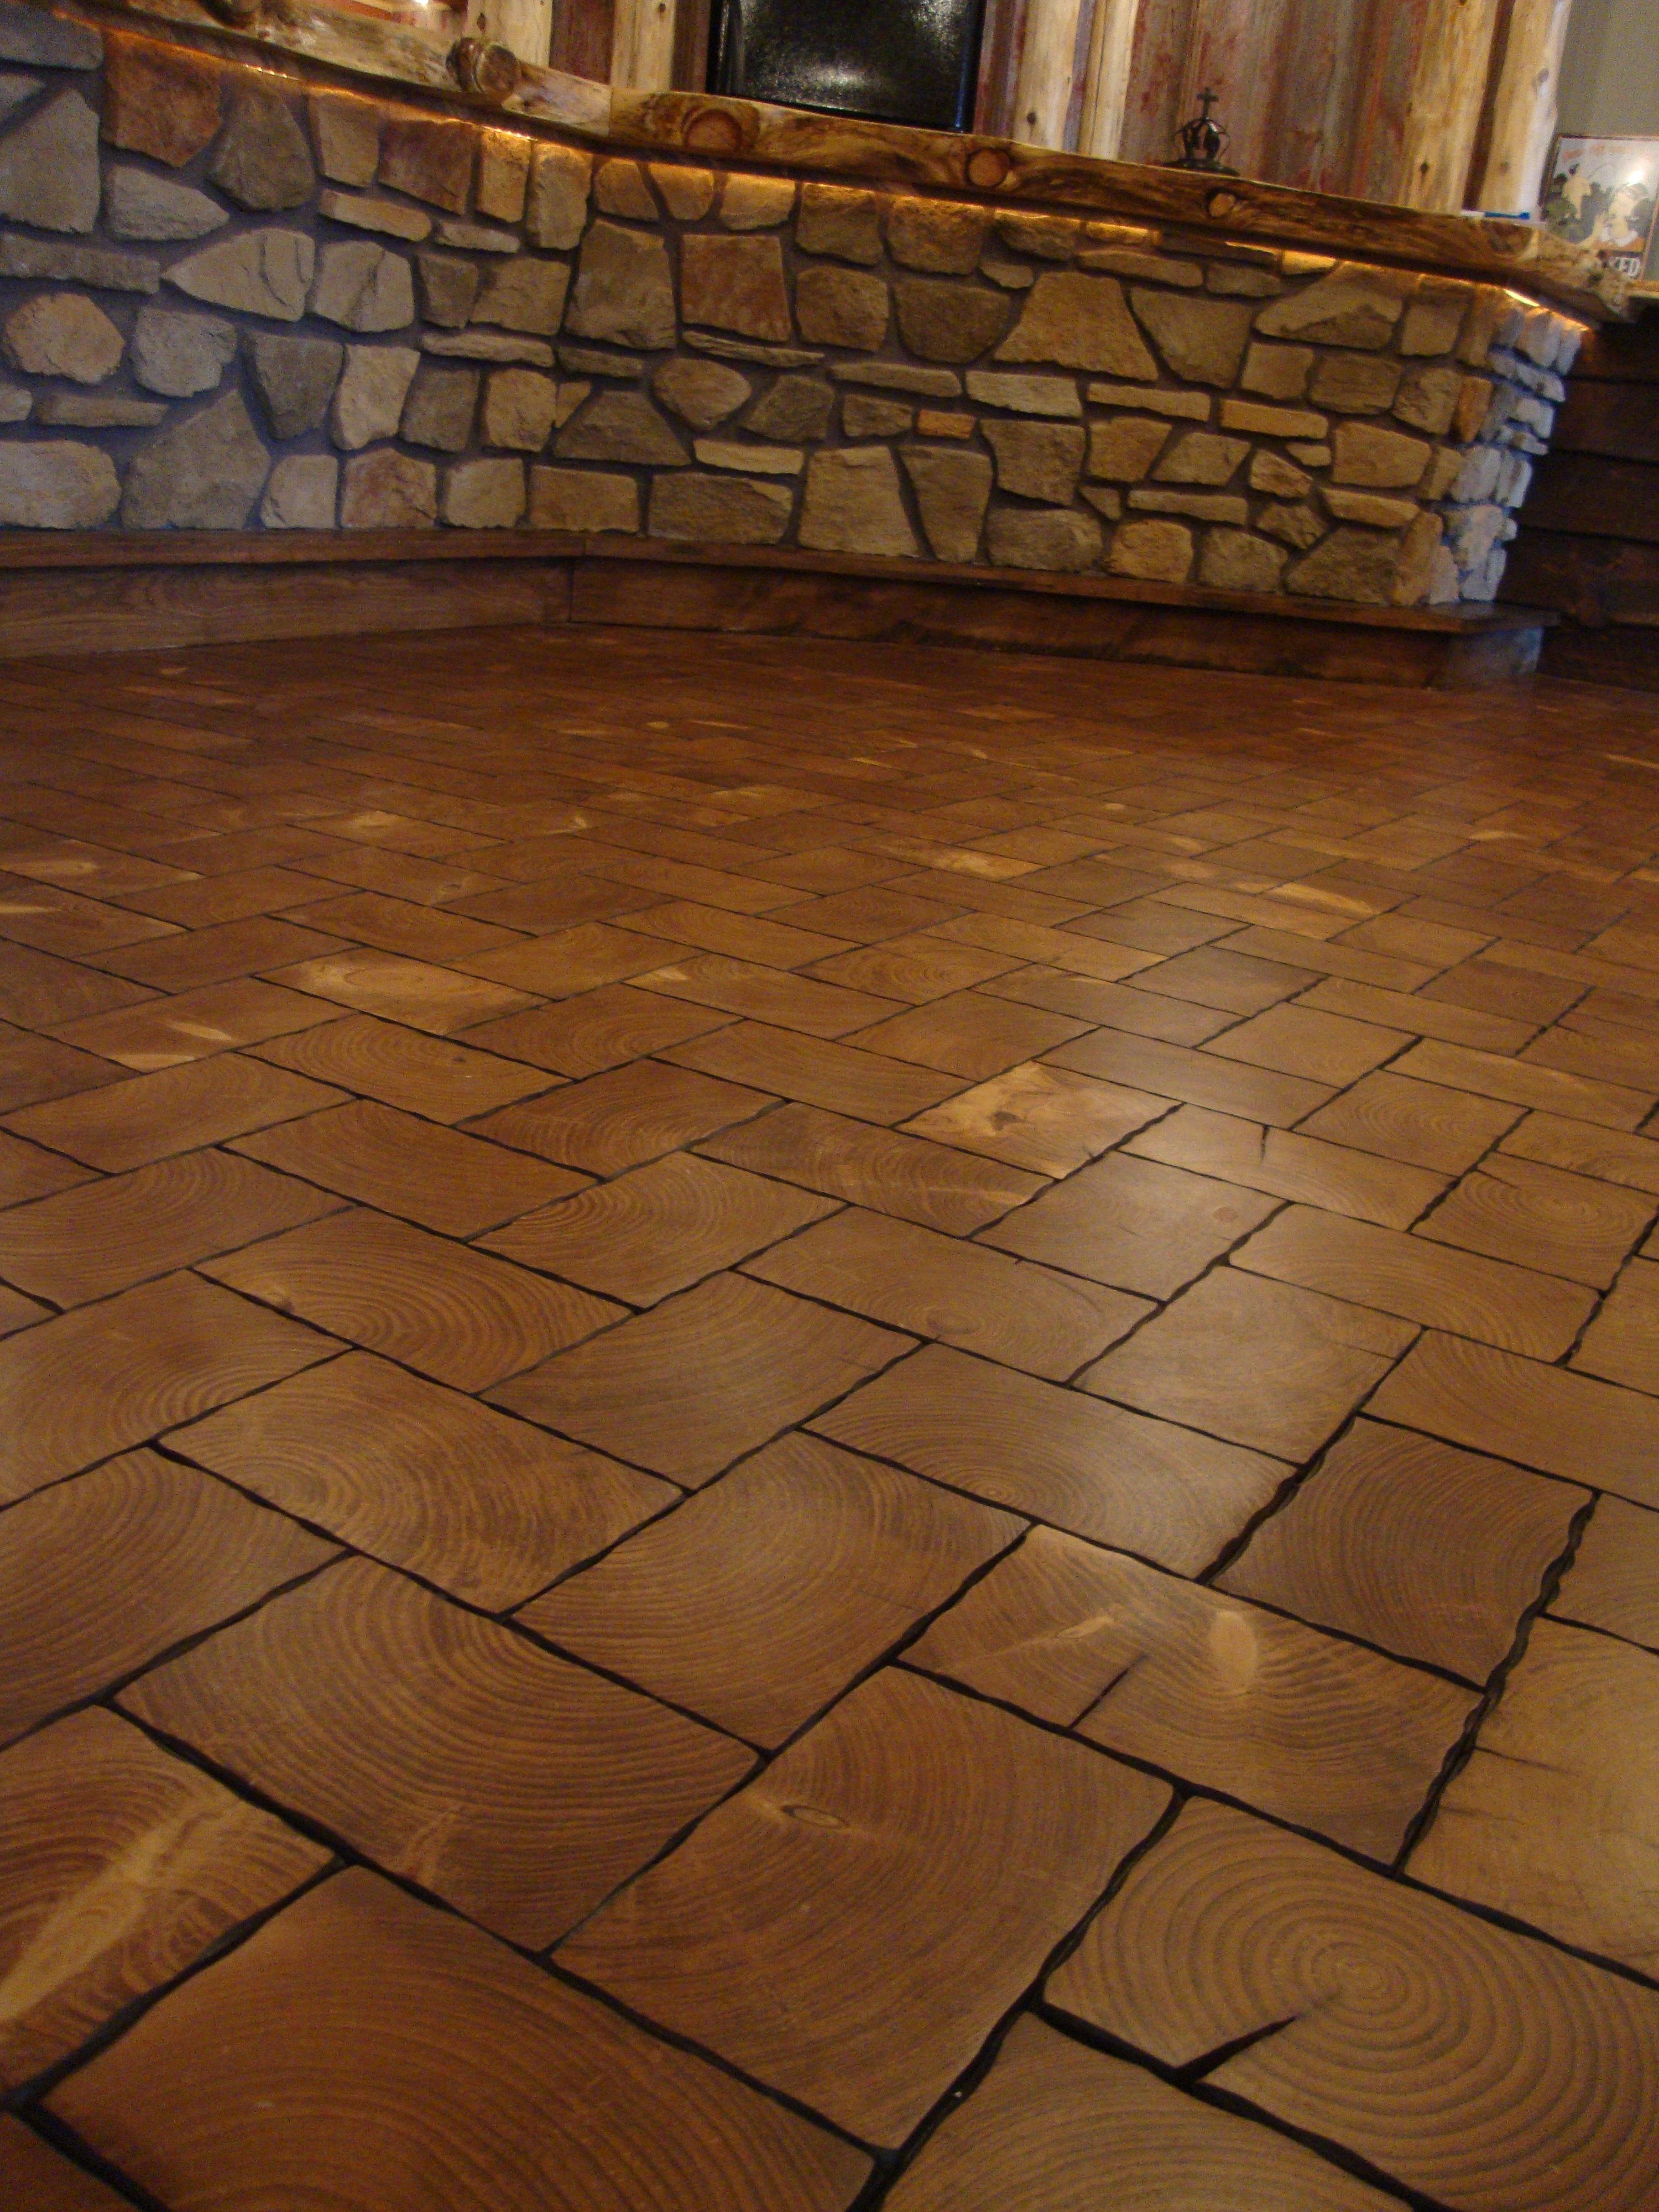 Pine End Grain Brick Floors